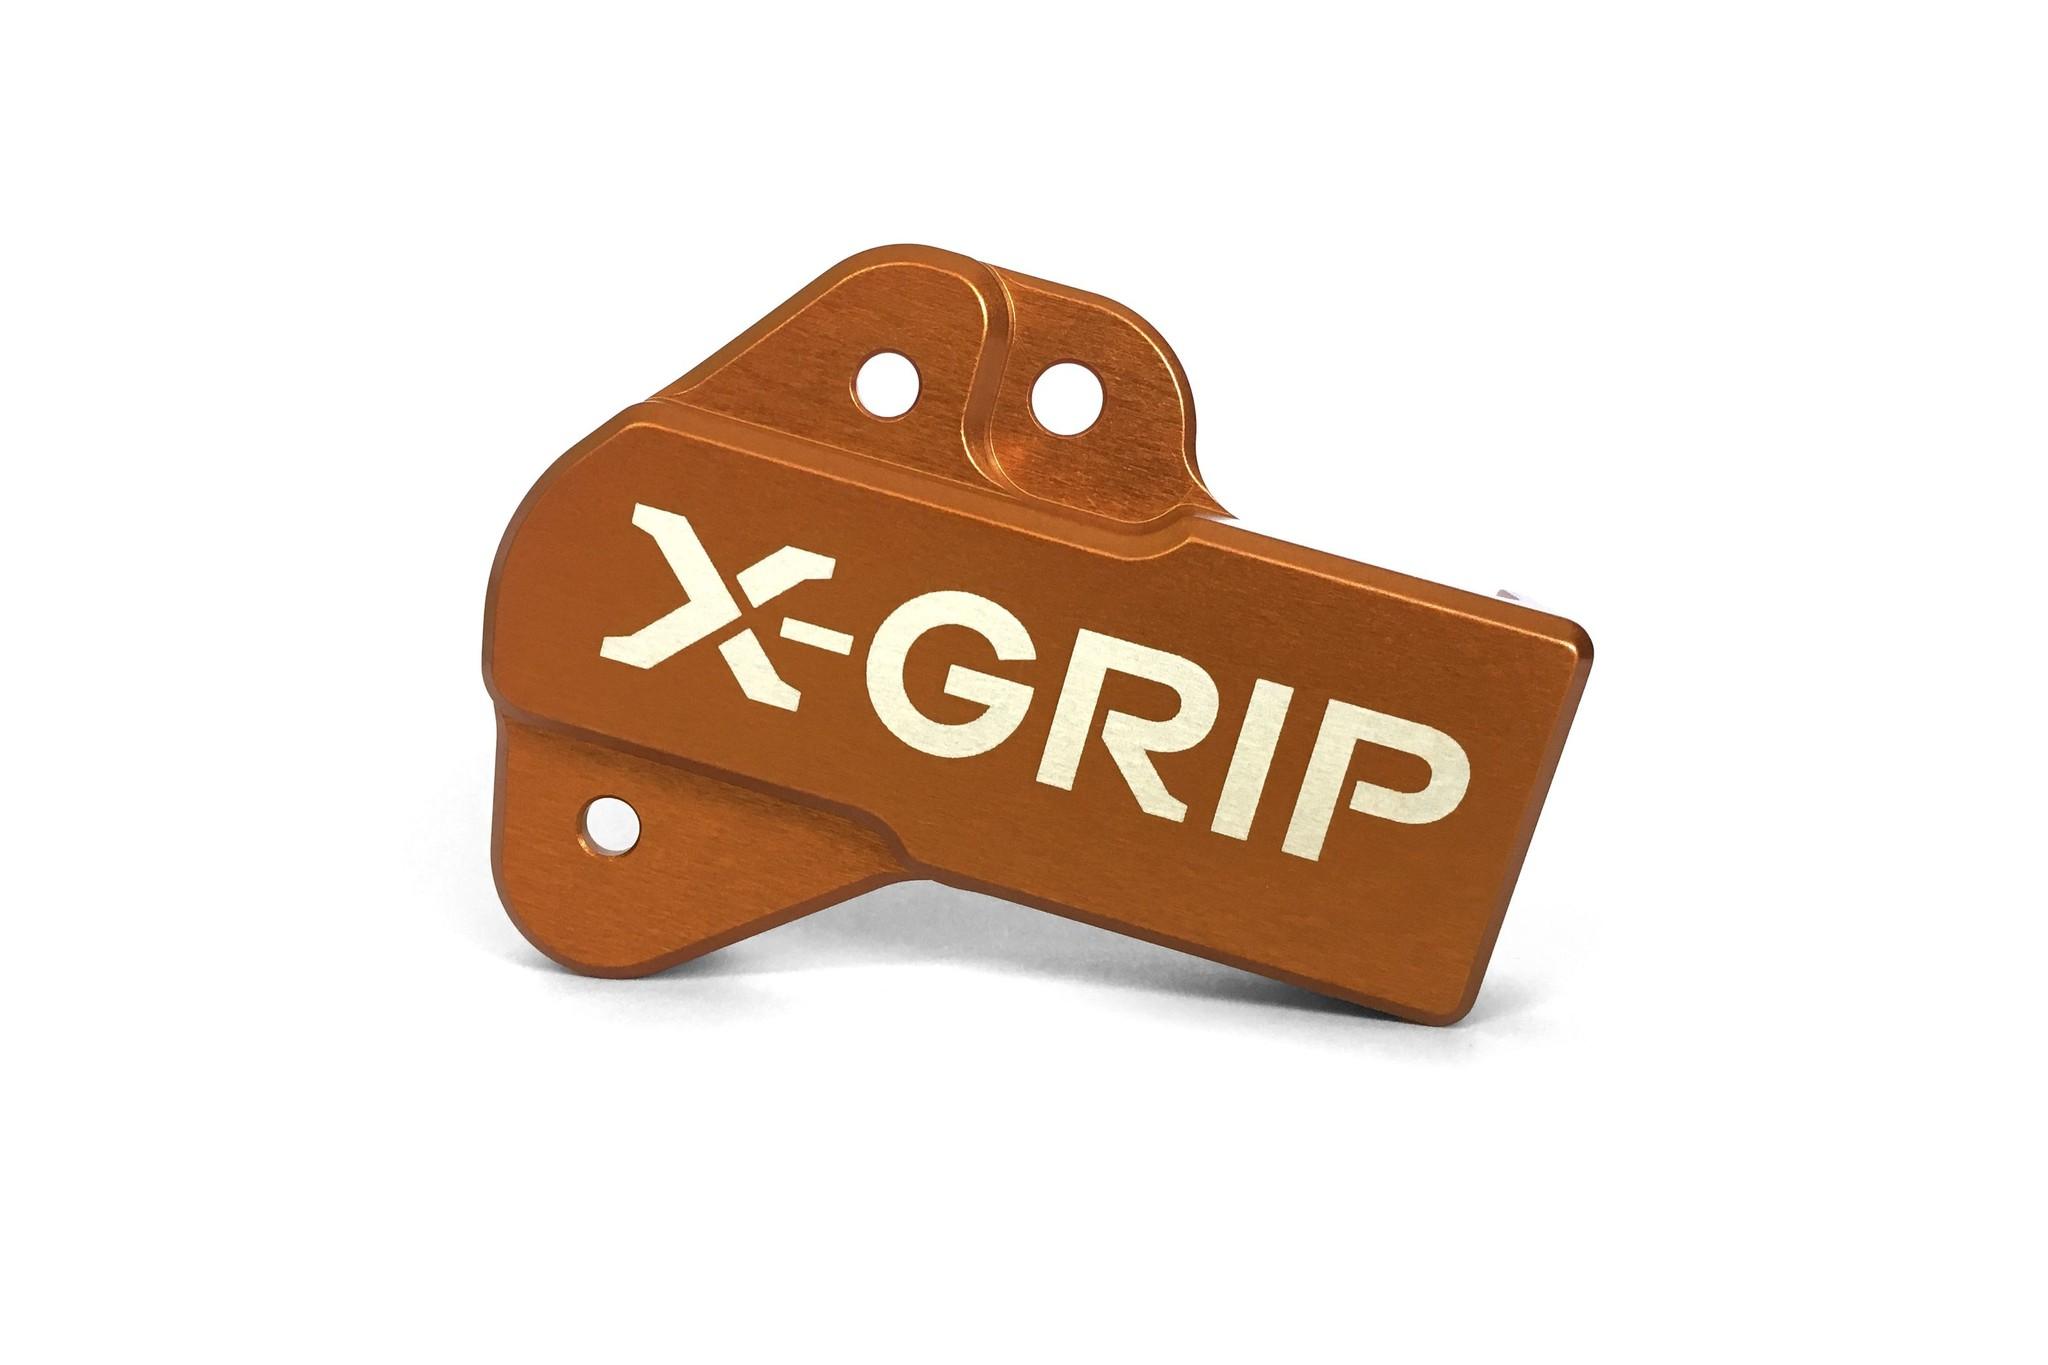 X-GRIP Throttle valve sensor protection  TPI / TEi